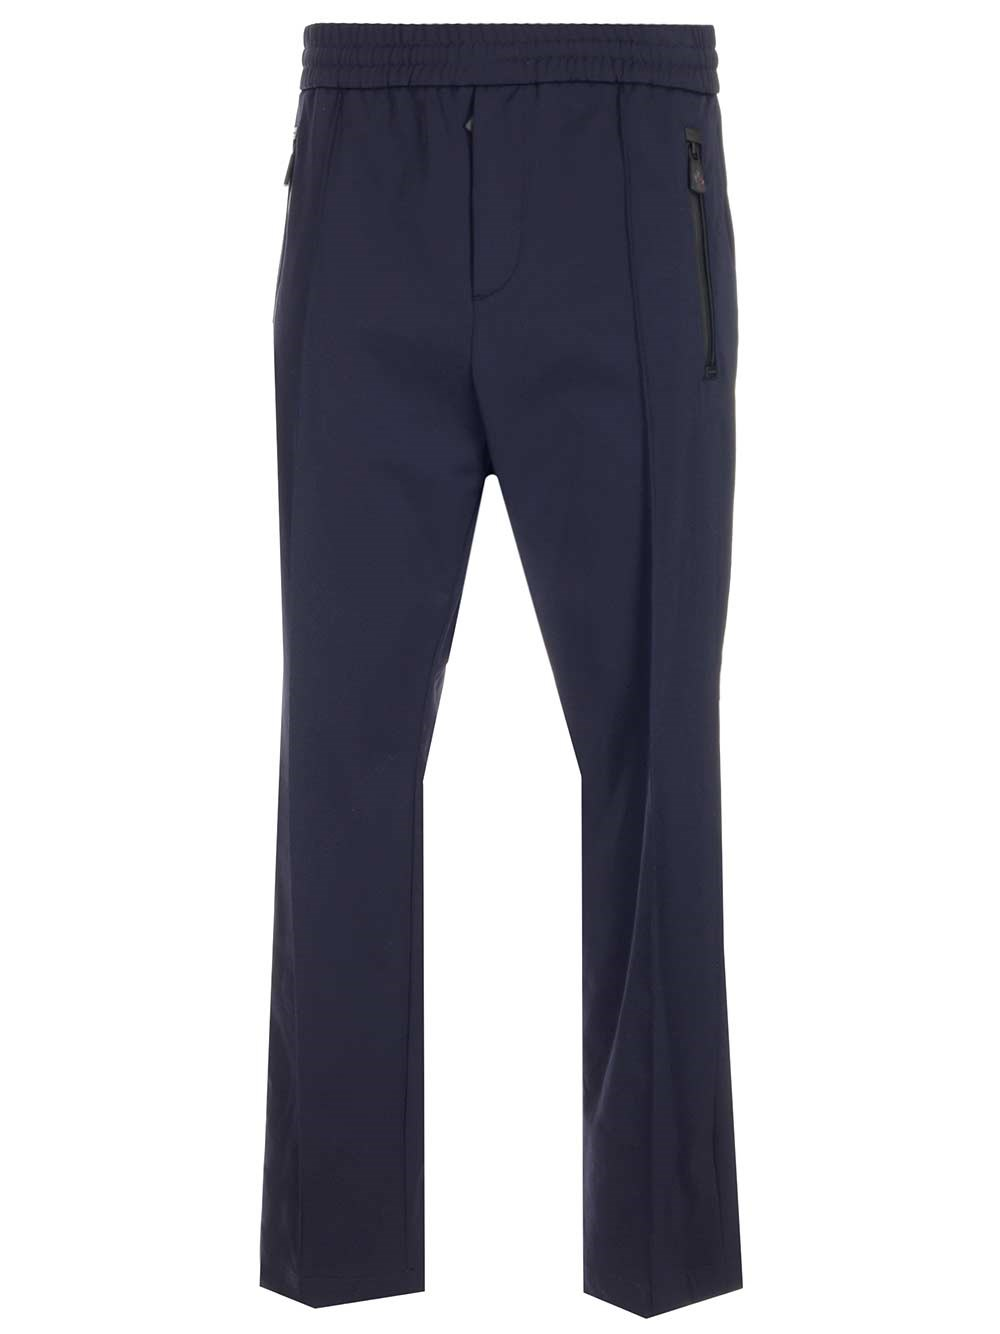 MONCLER GRENOBLE Fleece Track Pants